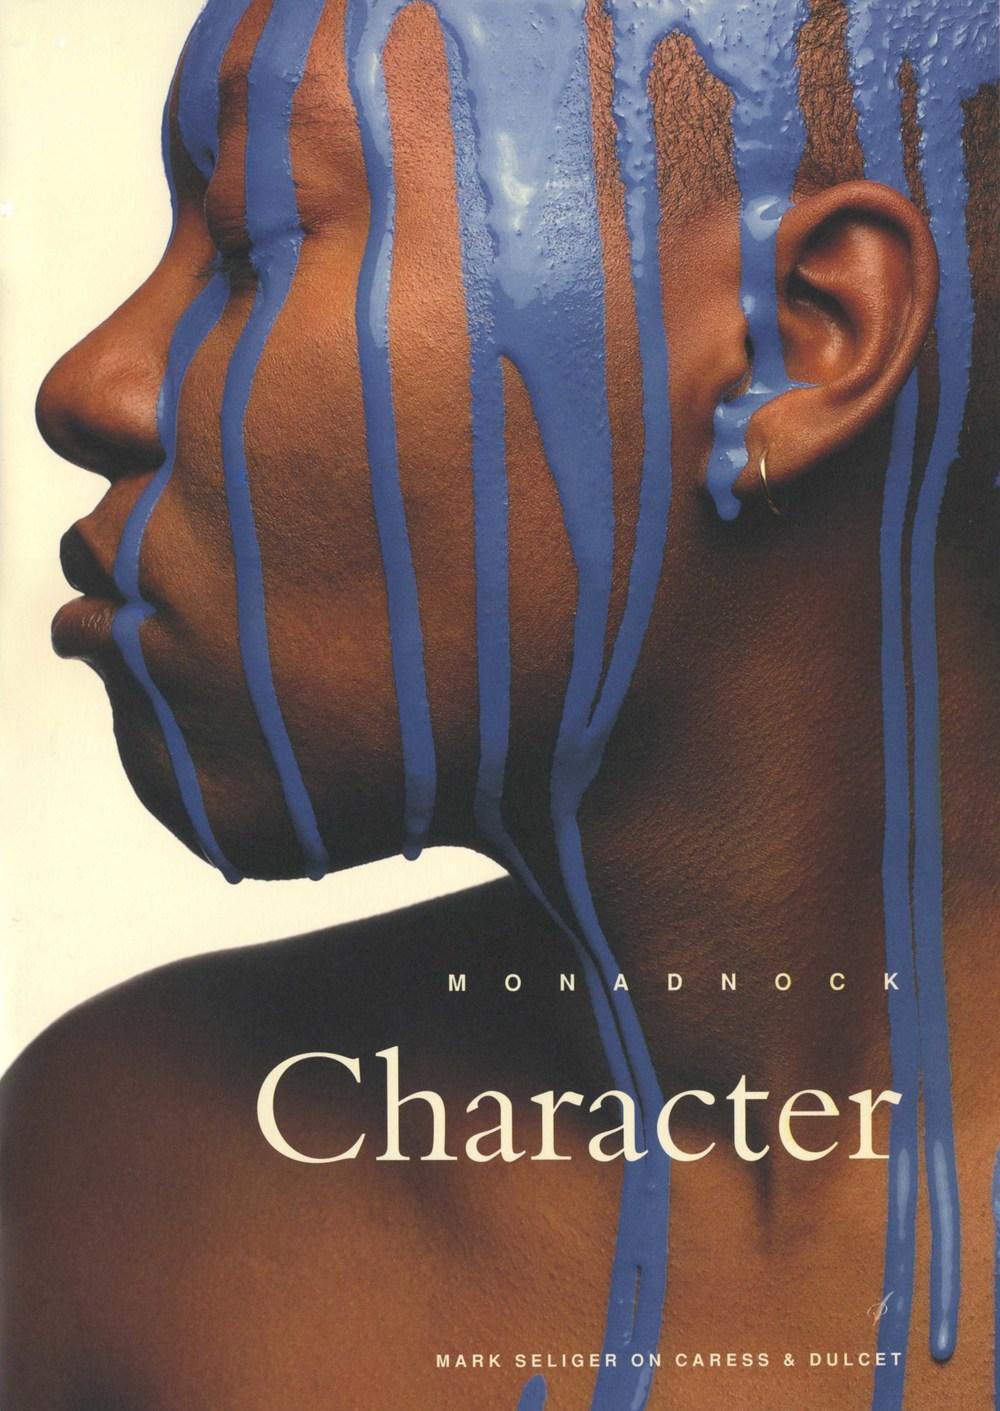 Monadnock Character